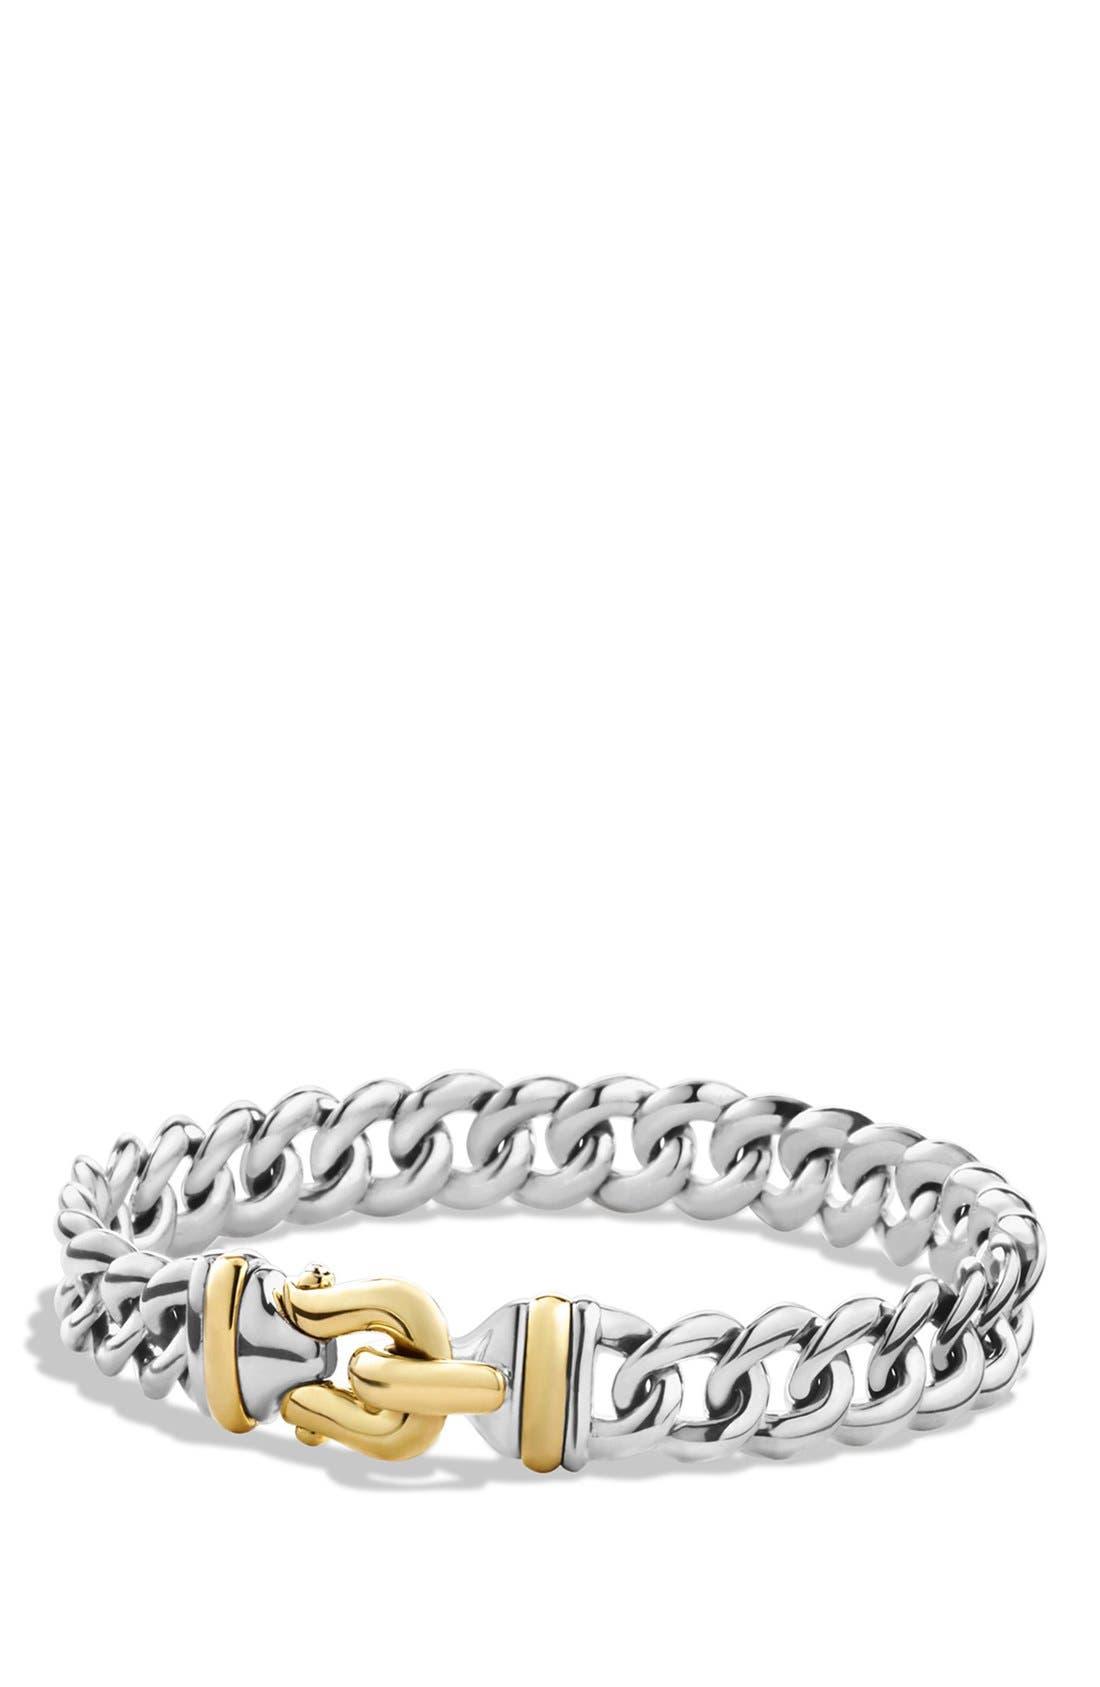 Main Image - David Yurman 'Buckle' Single-Row Bracelet with Gold